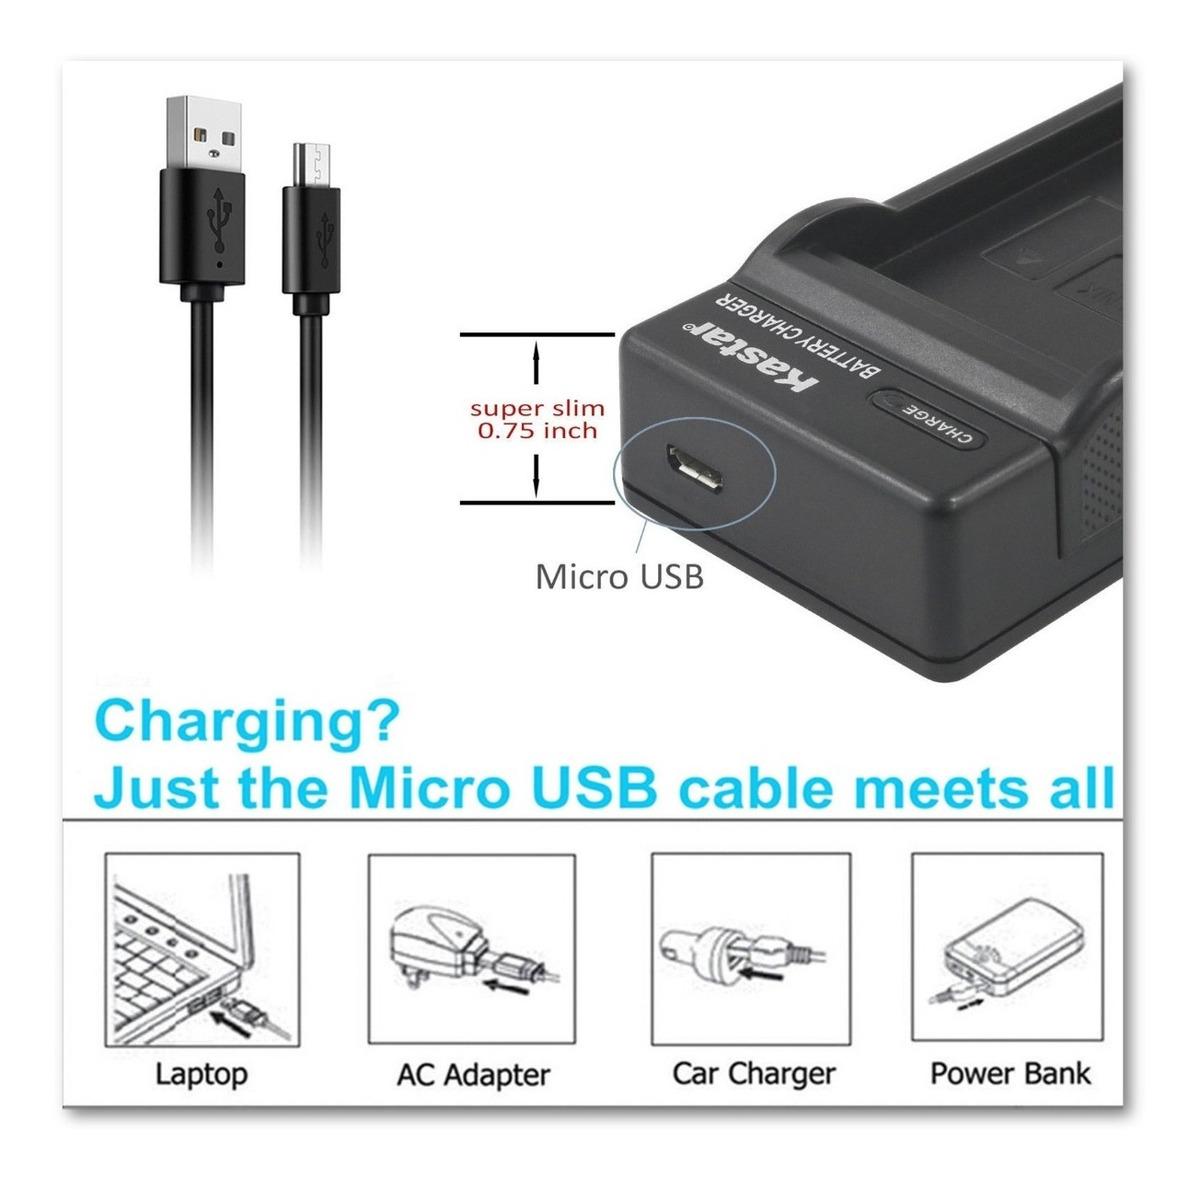 MICRO-USB BATERIA CARGADOR para NIKON CoolPix EN-EL5